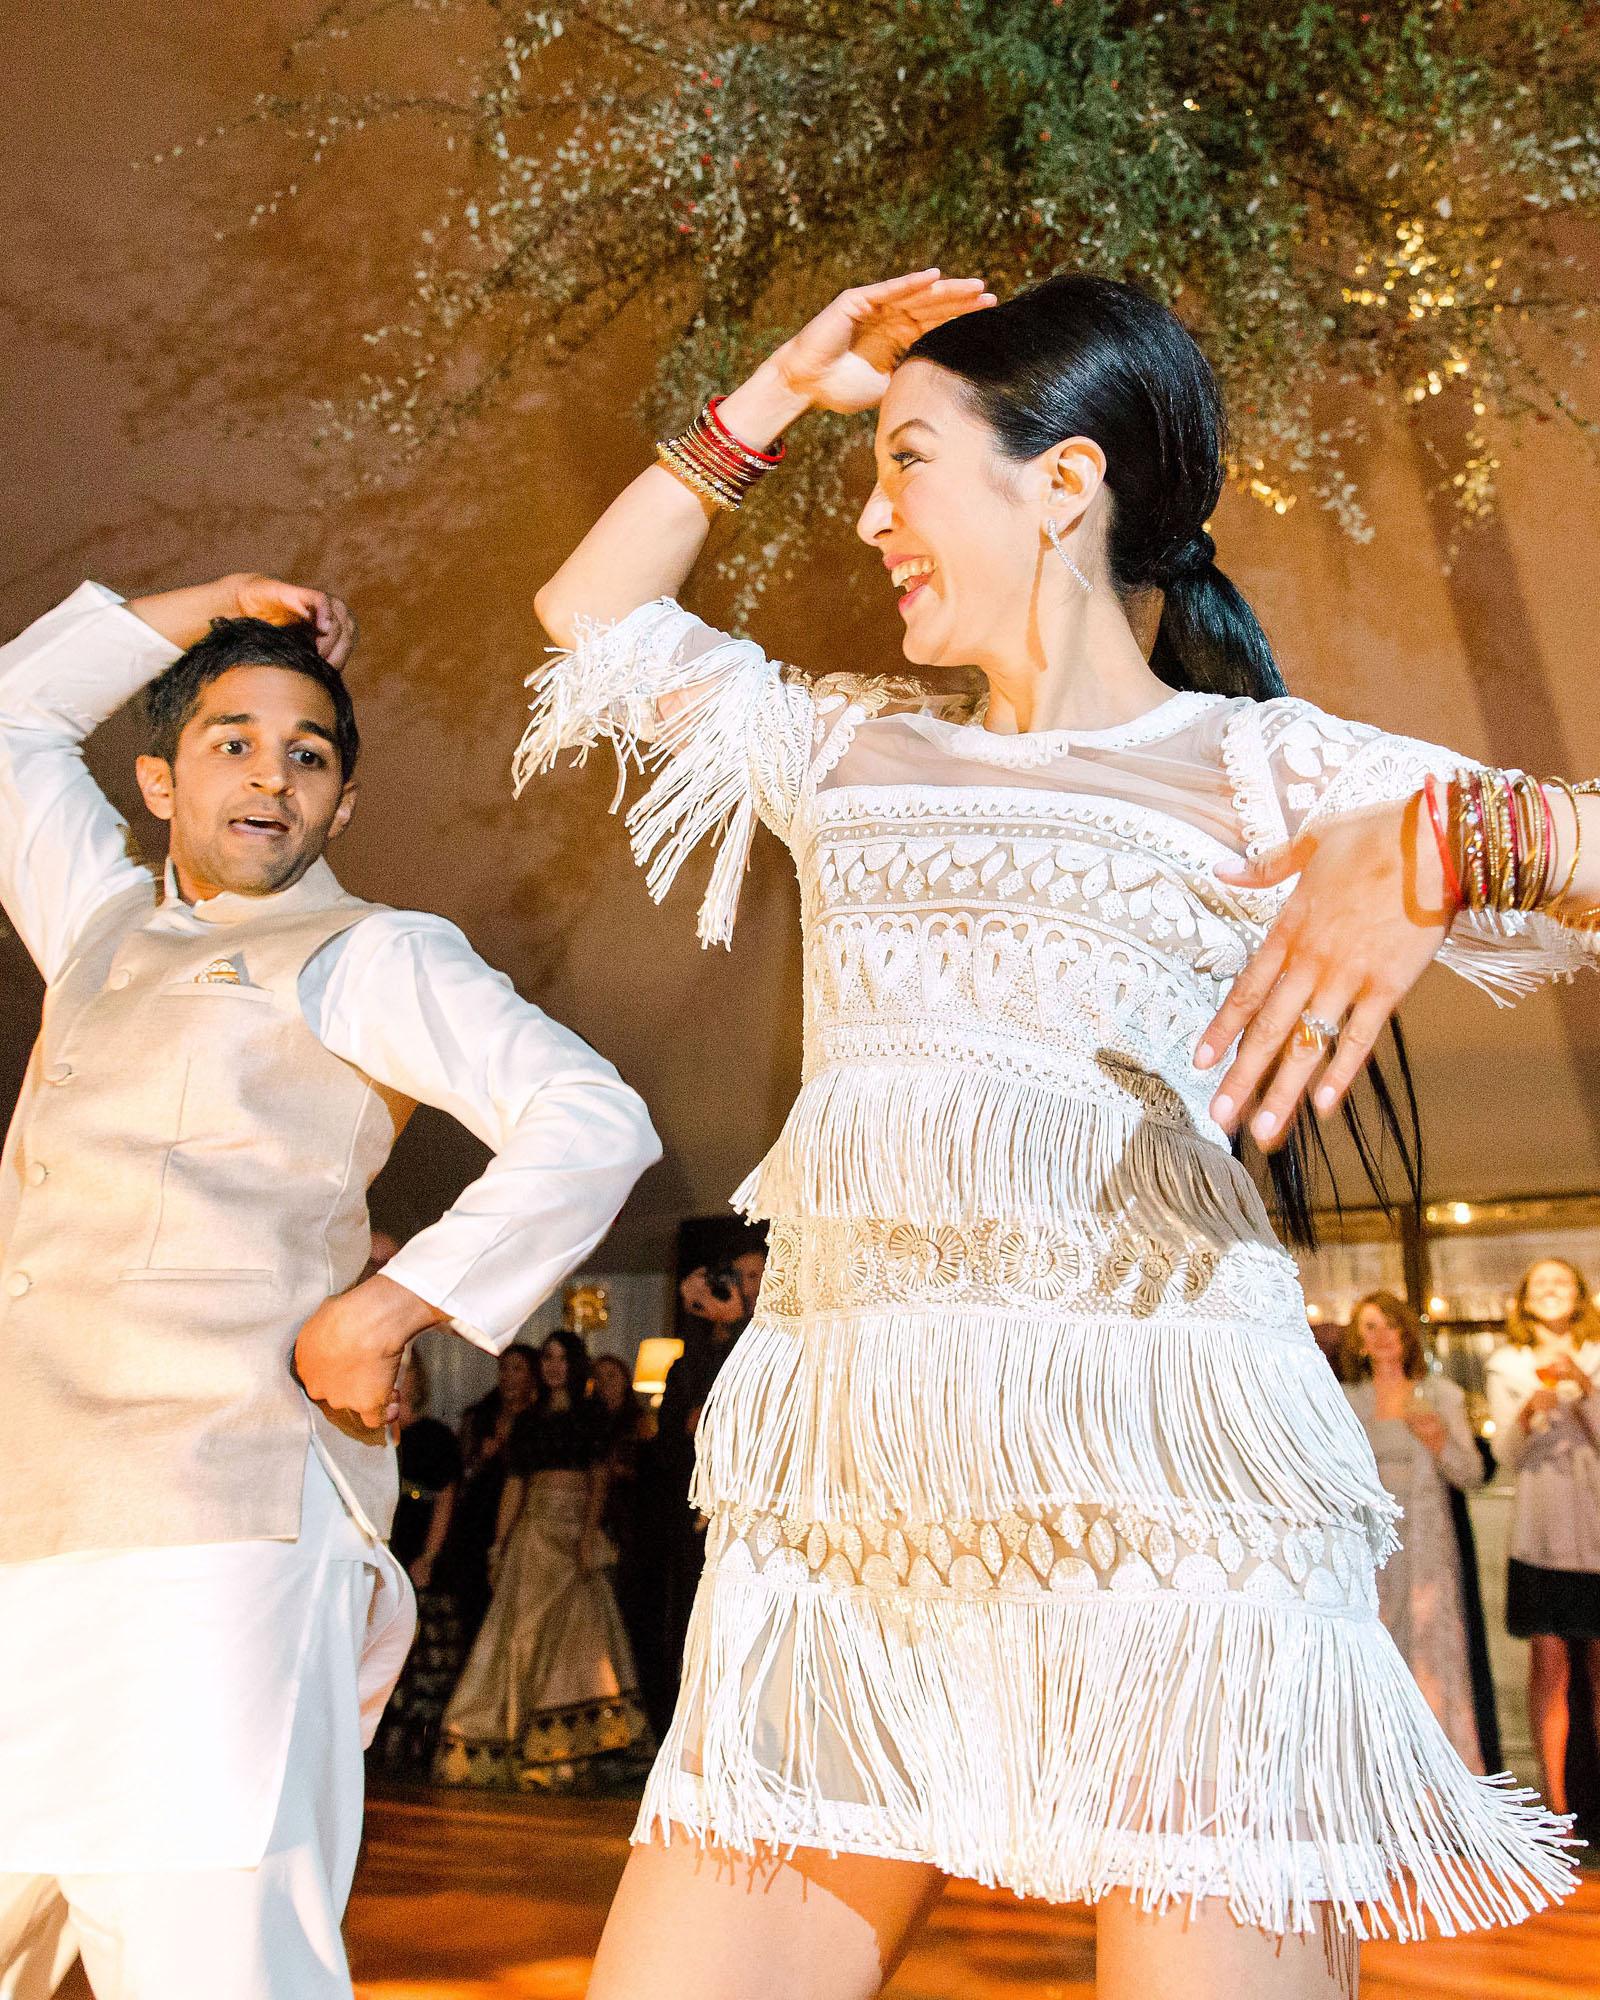 jenna alok wedding wine country california couple dancing